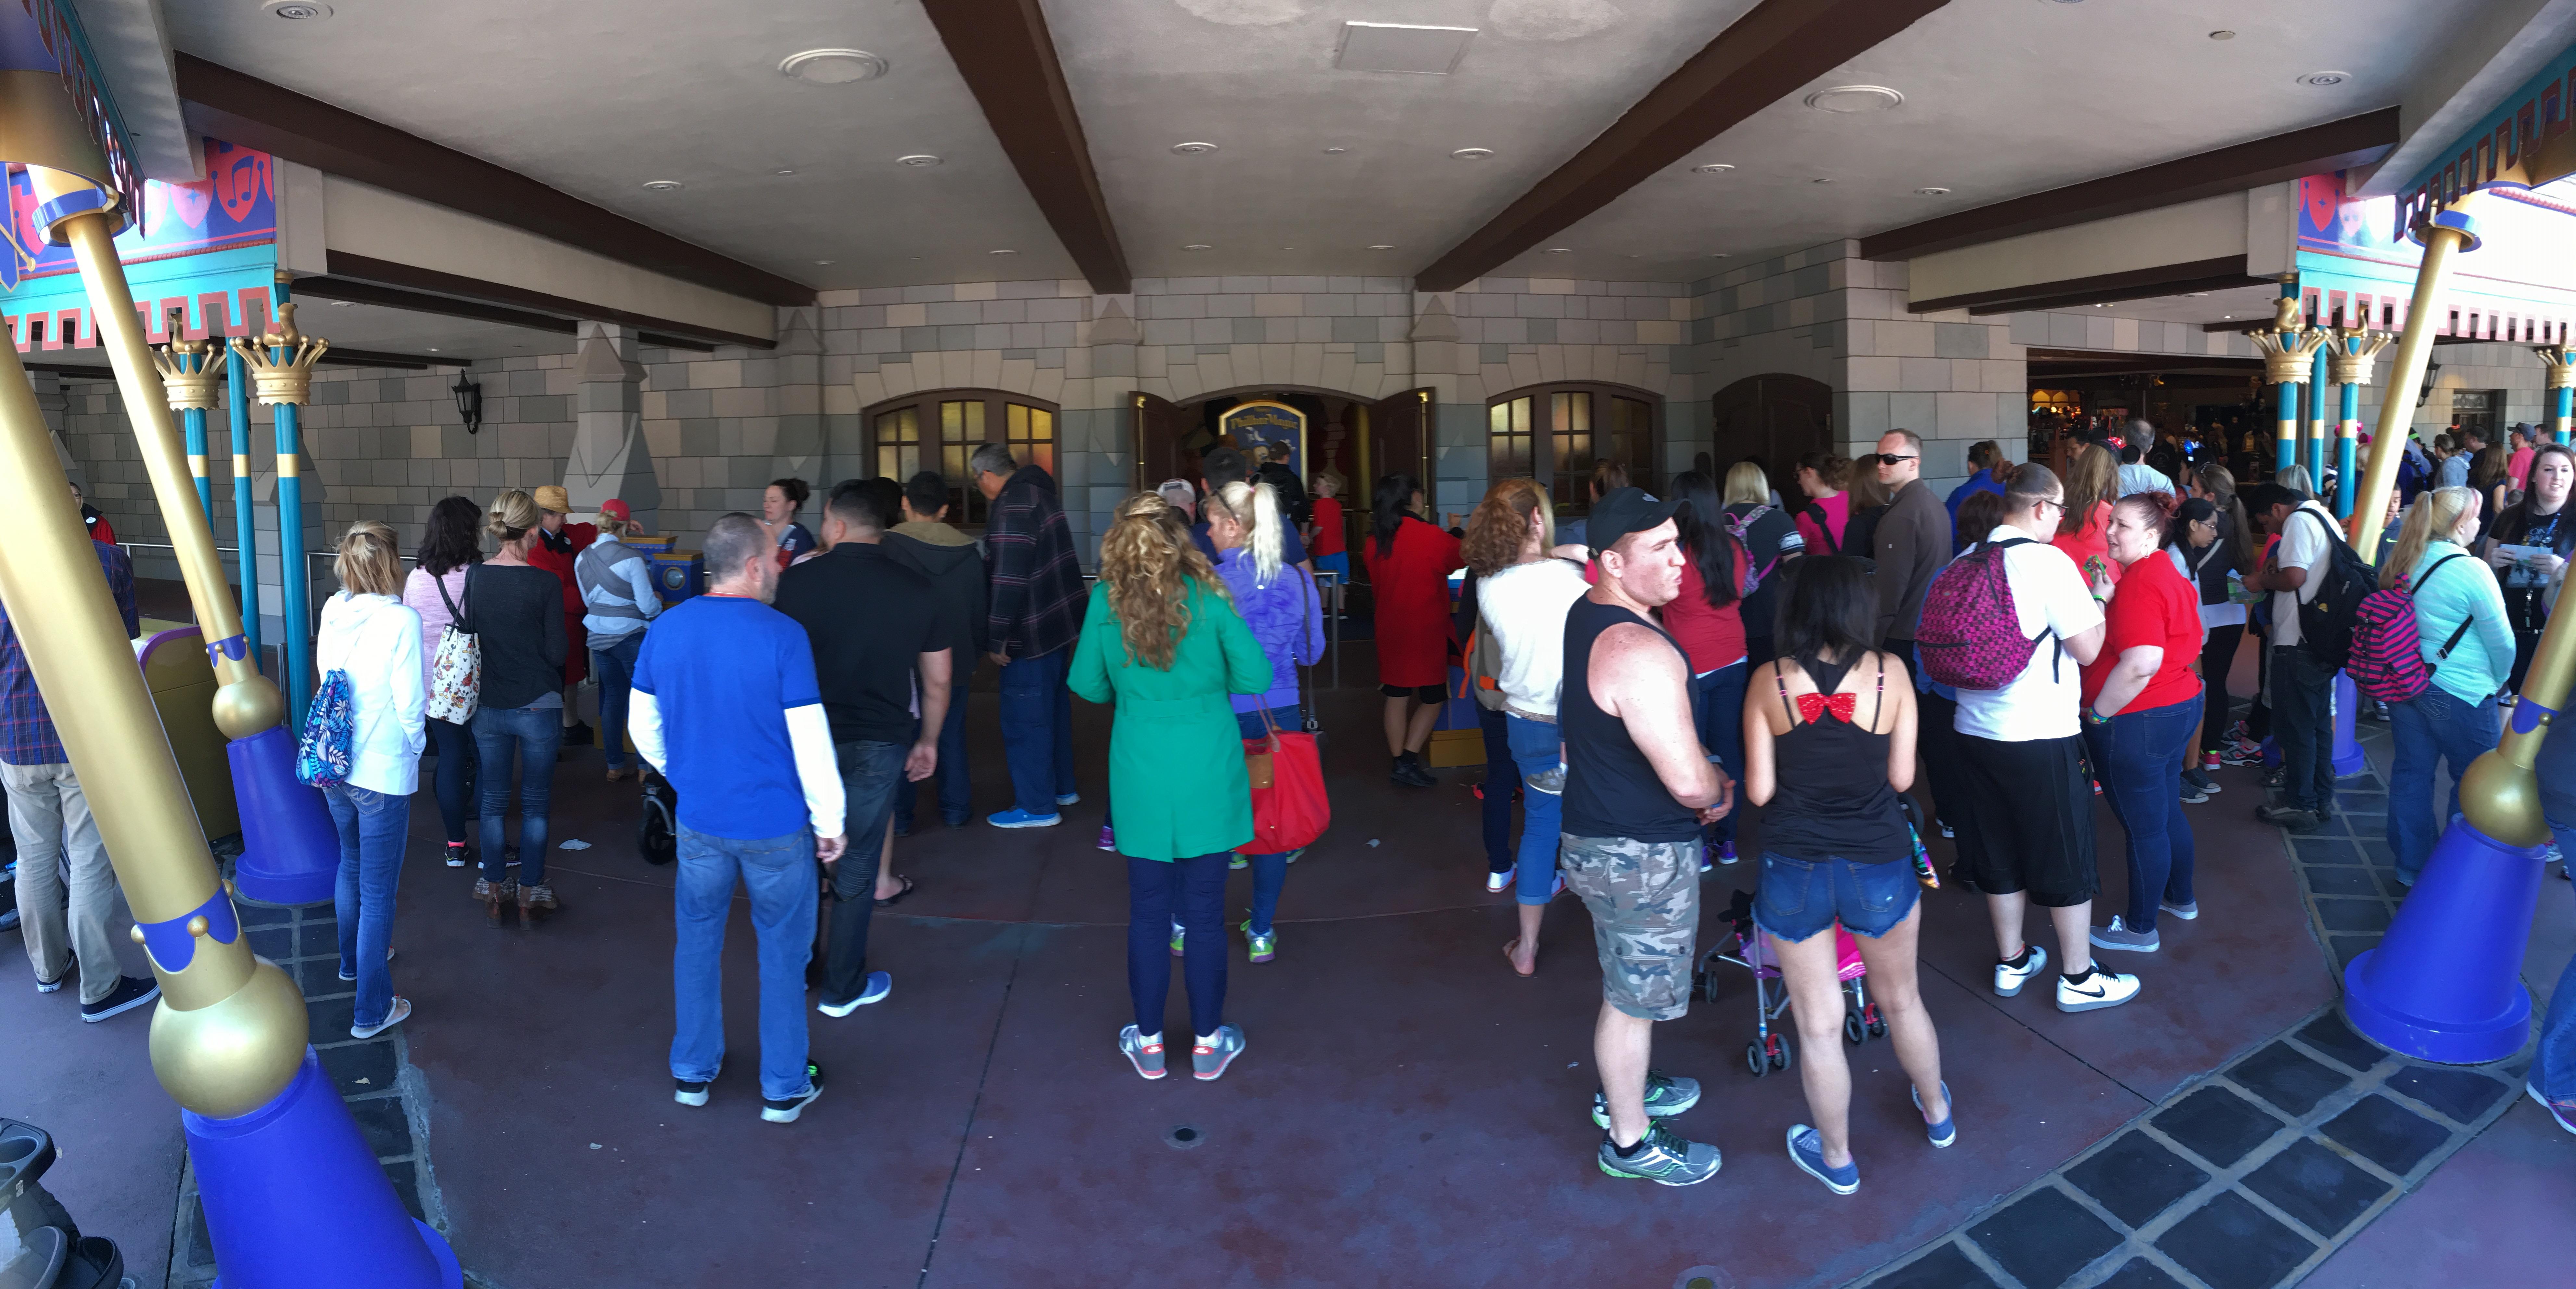 FastPass+ Kiosk Lines - Fantasyland - Walt Disney World Magic Kingdom